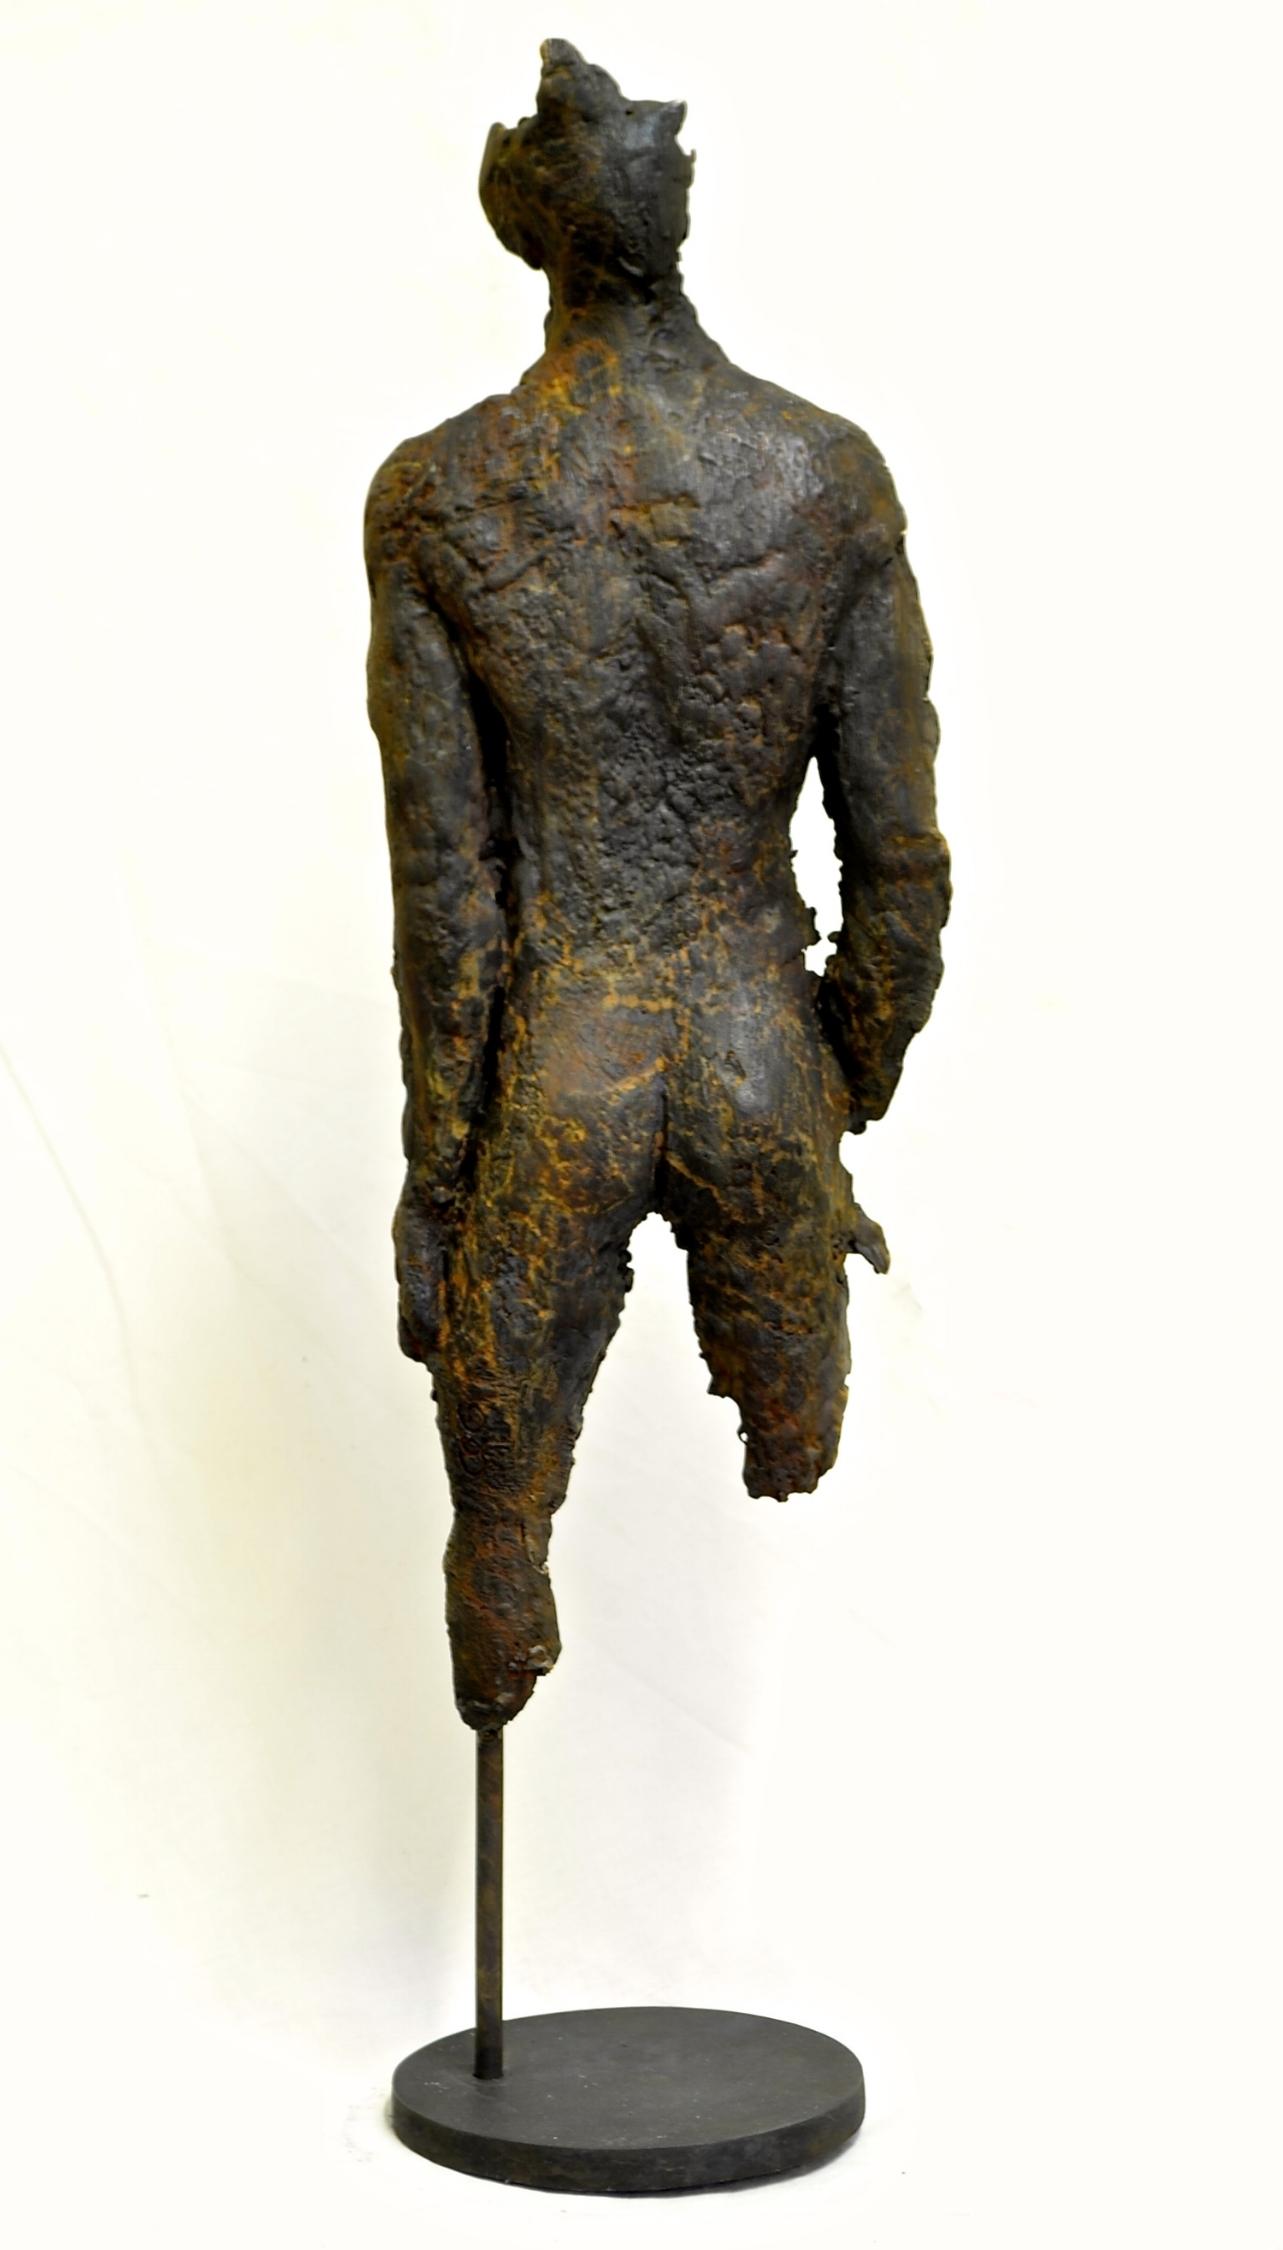 Image 1. bronze 19cm on 10cm base by Catherine Greene 2